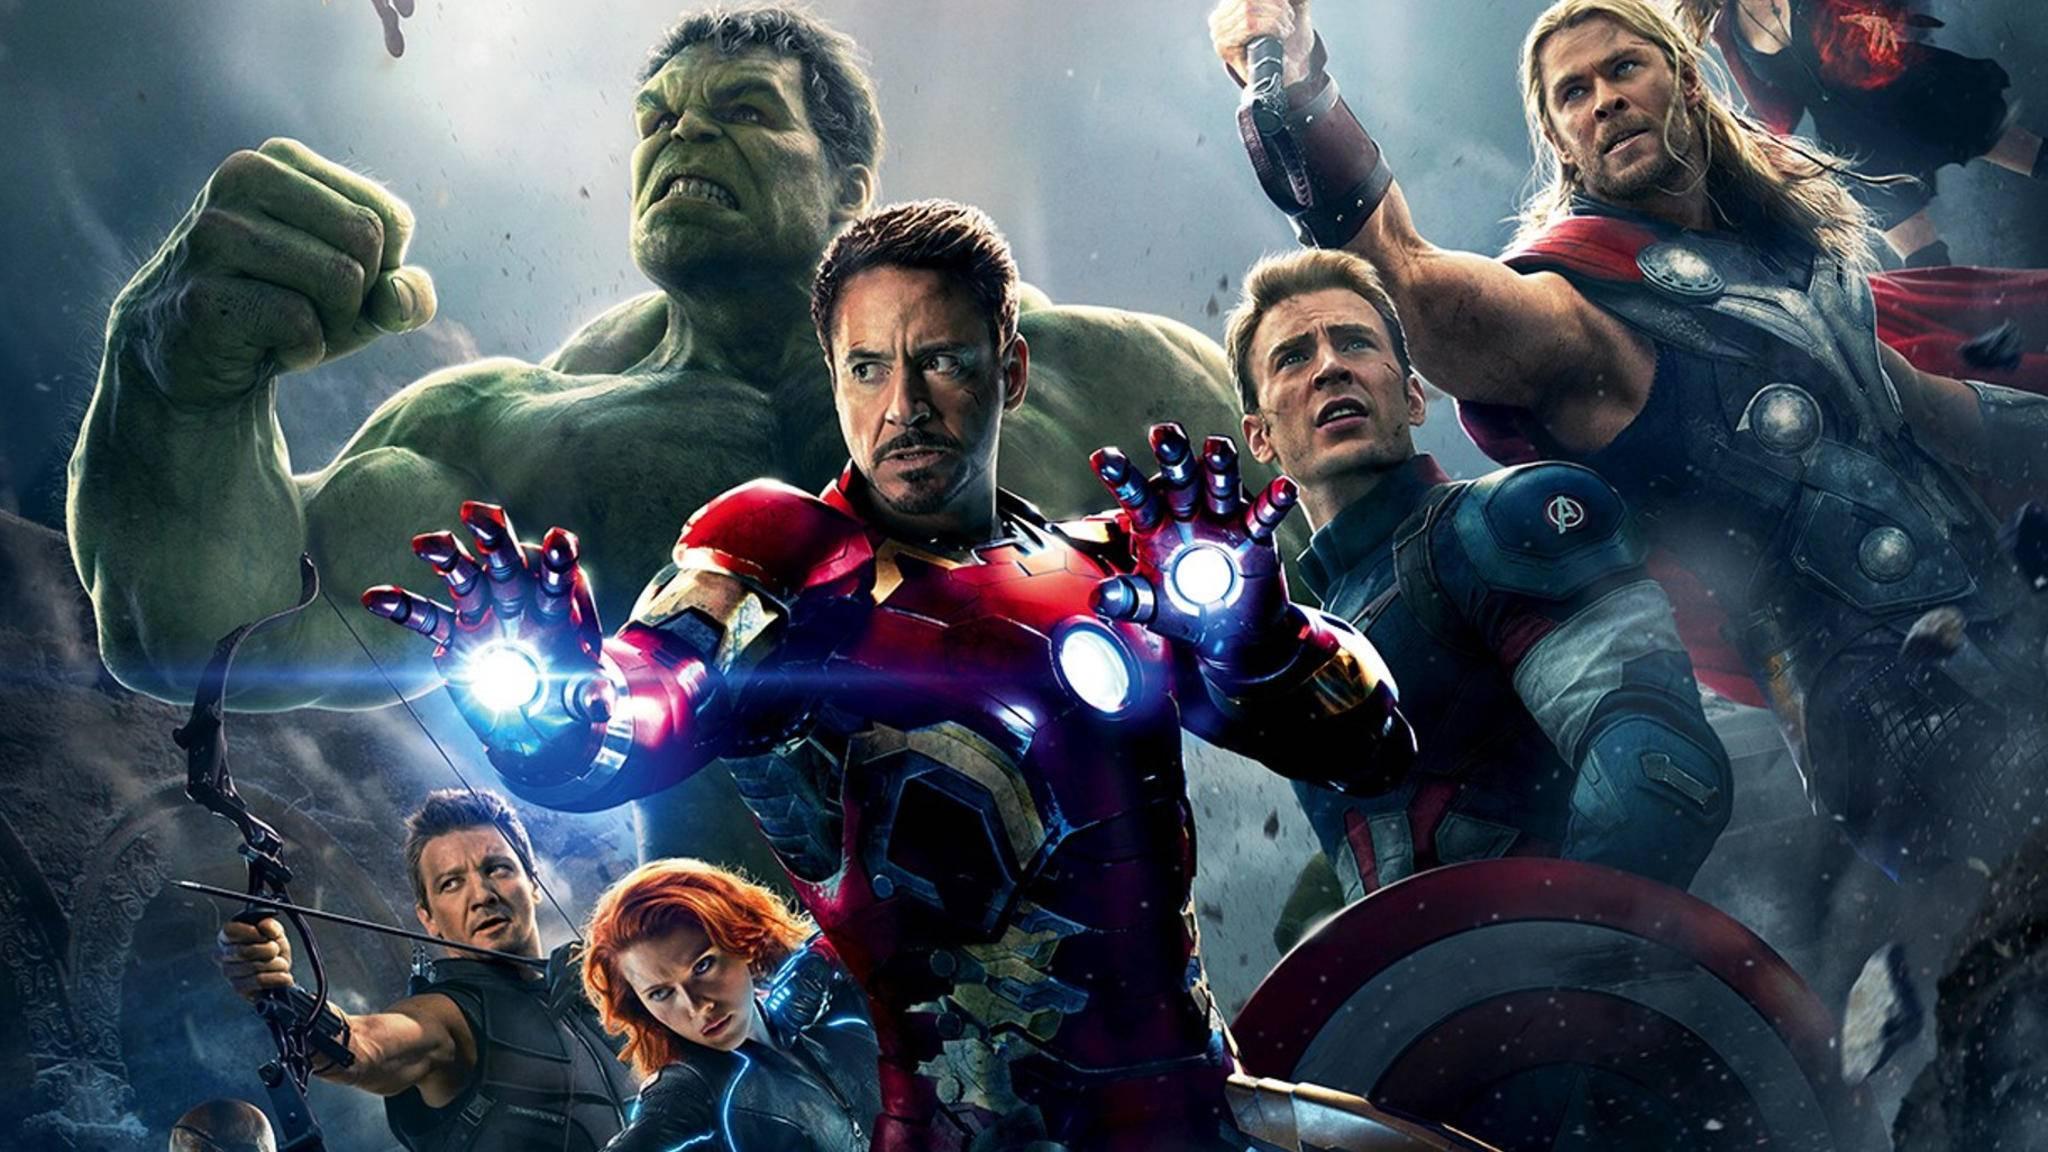 """Avengers: Infinity War"" soll ""ganz anders"" werden als seine Vorgänger."